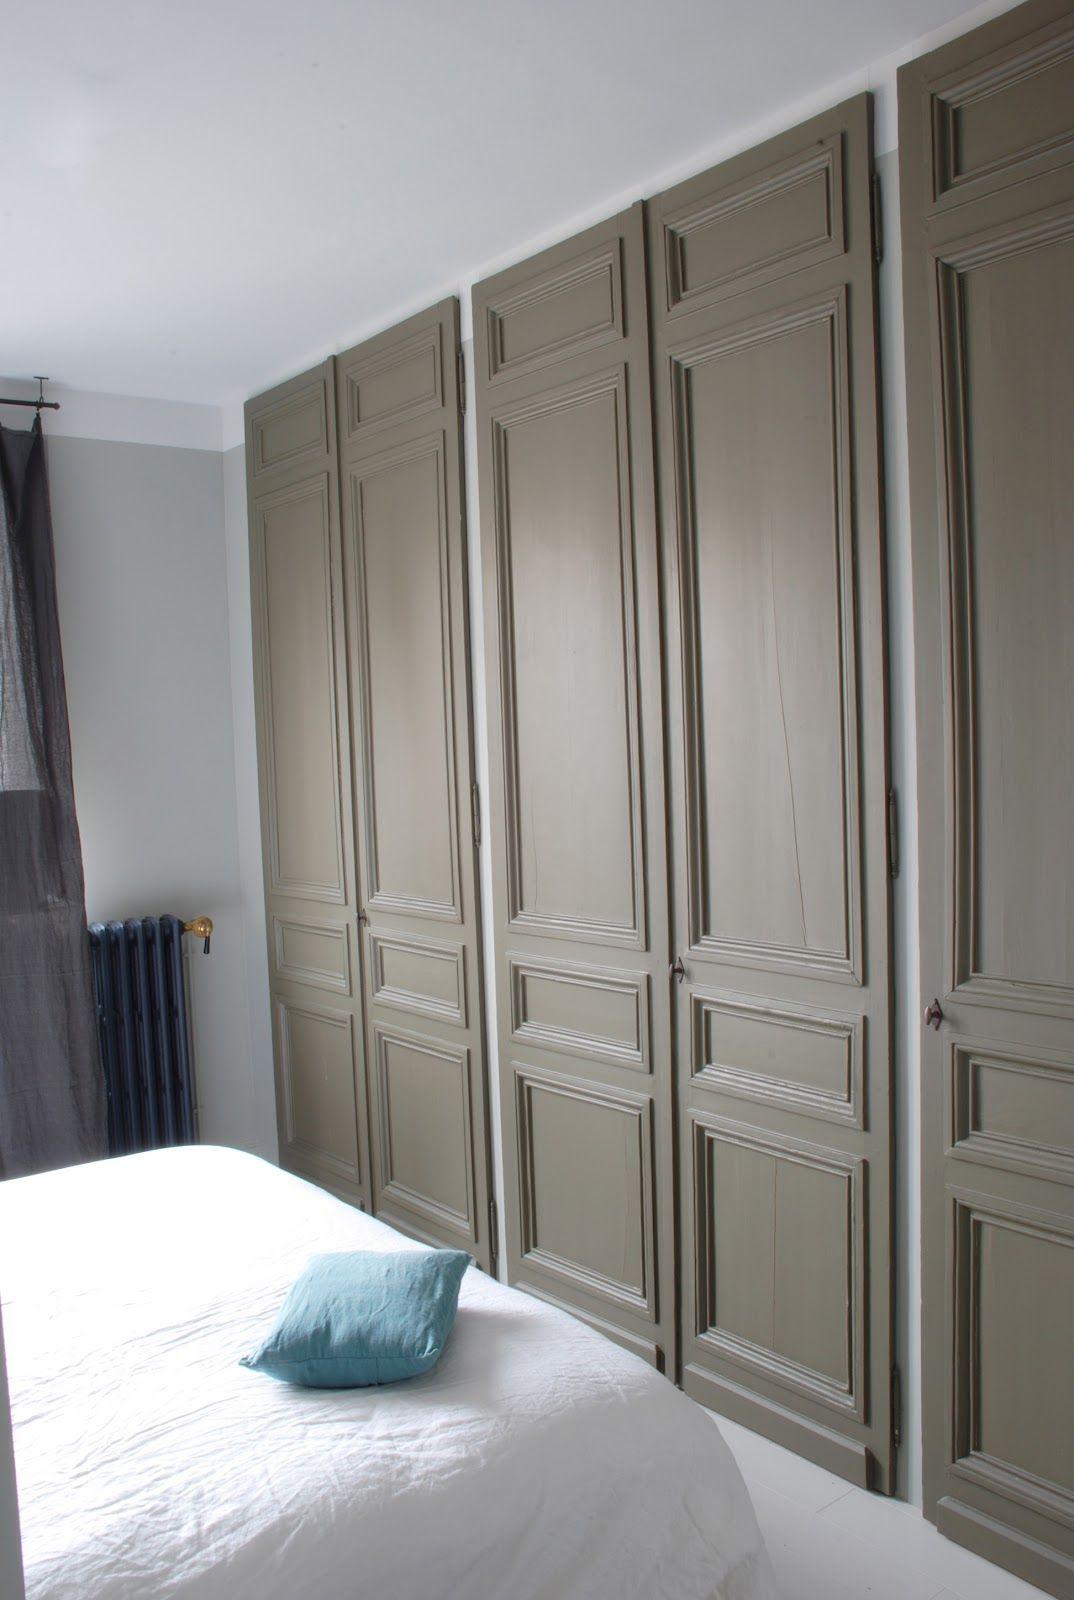 transformer une armoire en dressing dressing chambre parentale luxe dressing chambre enfant. Black Bedroom Furniture Sets. Home Design Ideas